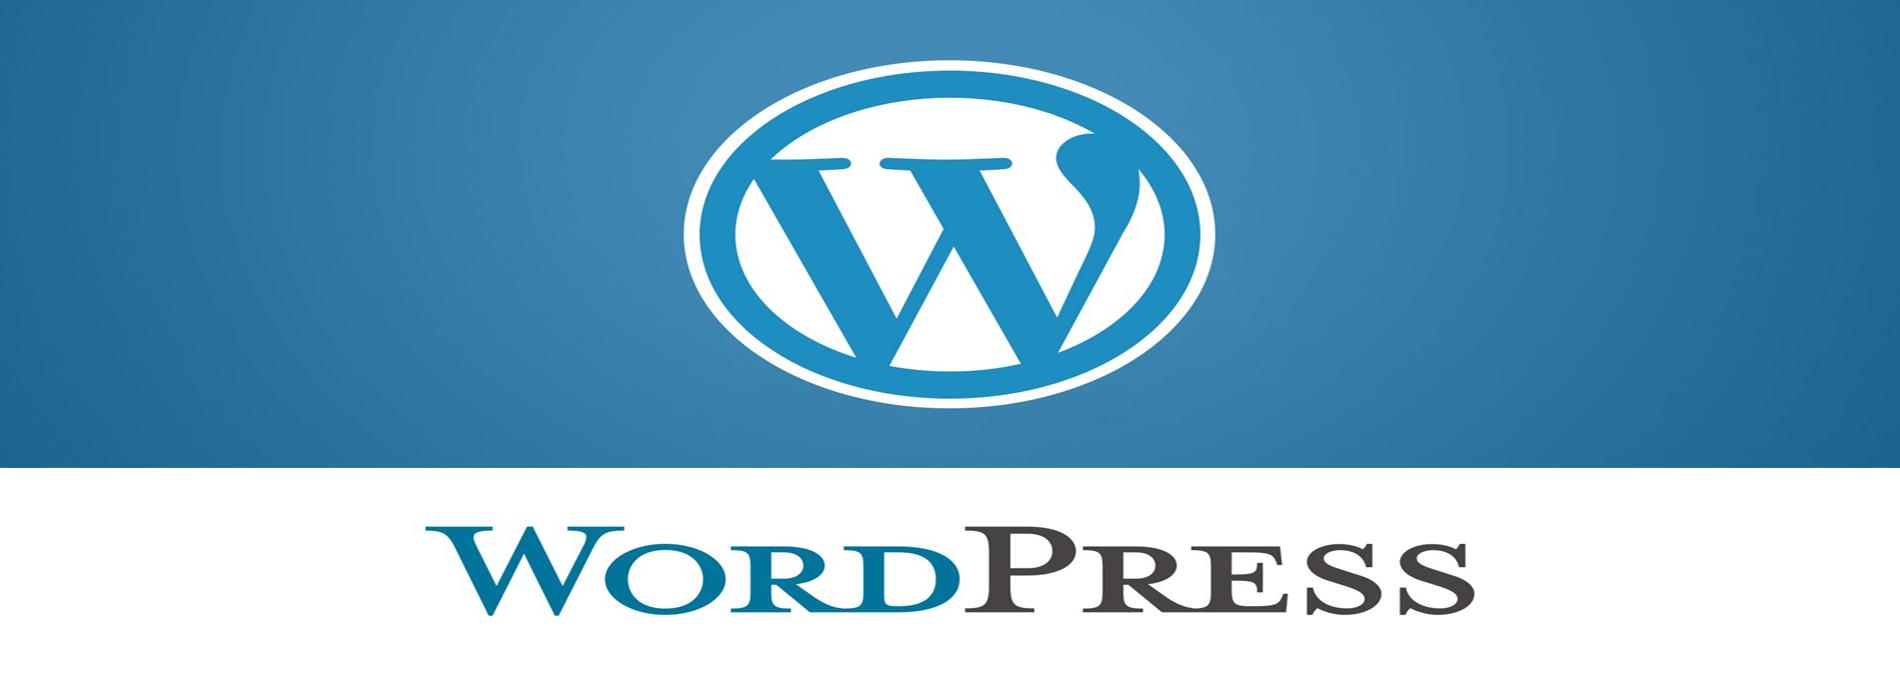 cara membuat website profesional dengan wordpress